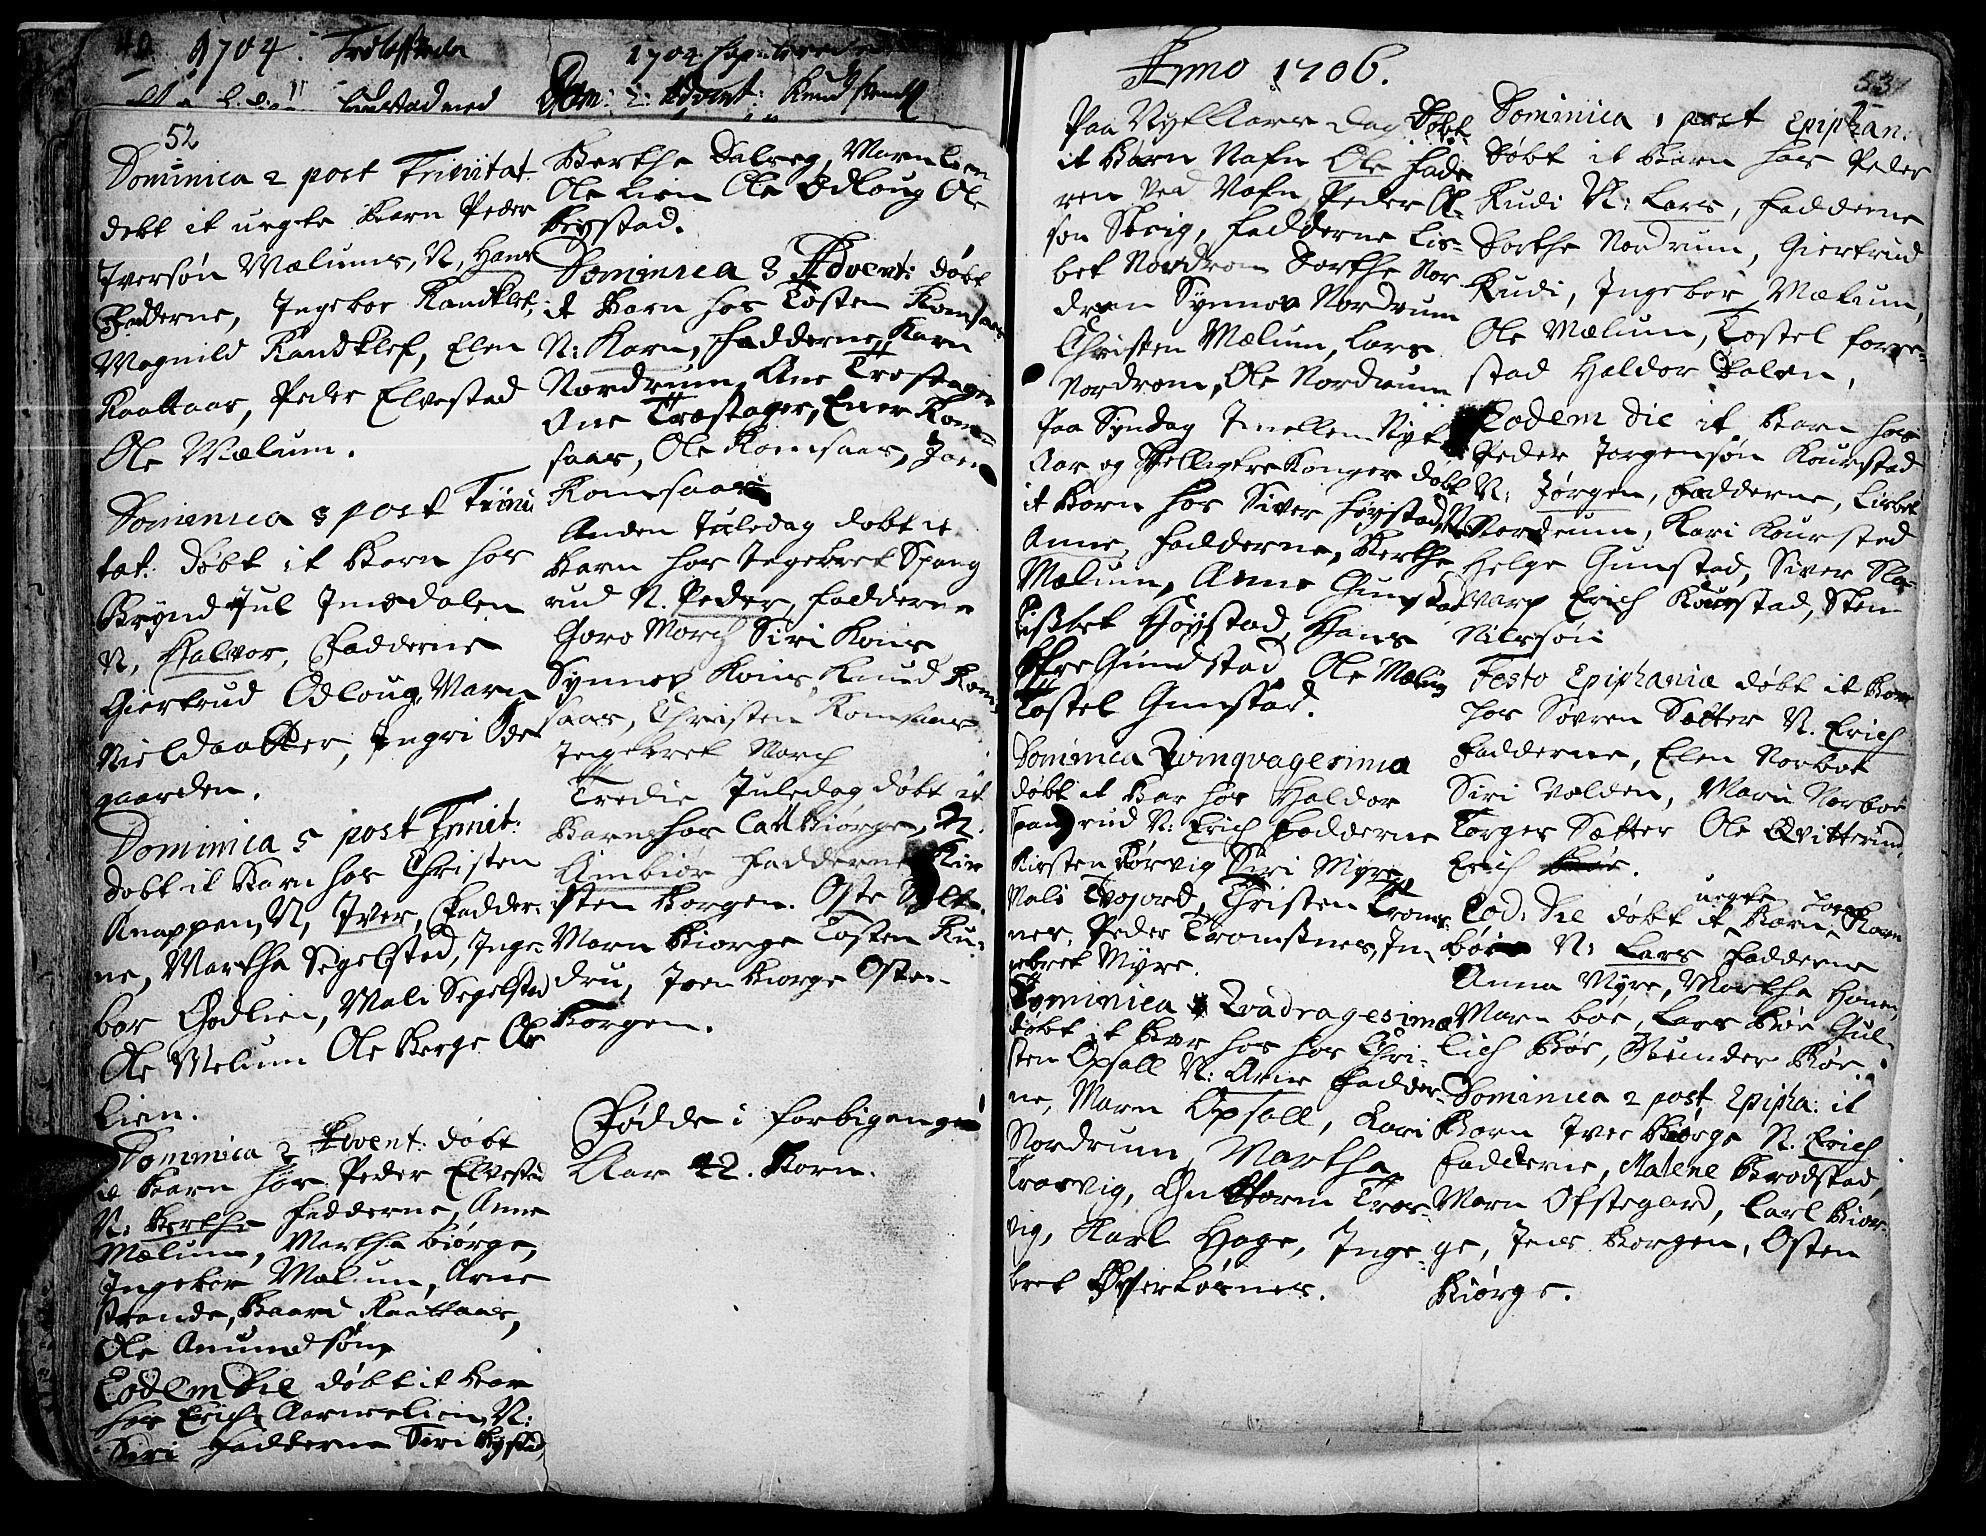 SAH, Ringebu prestekontor, Ministerialbok nr. 1, 1696-1733, s. 52-53